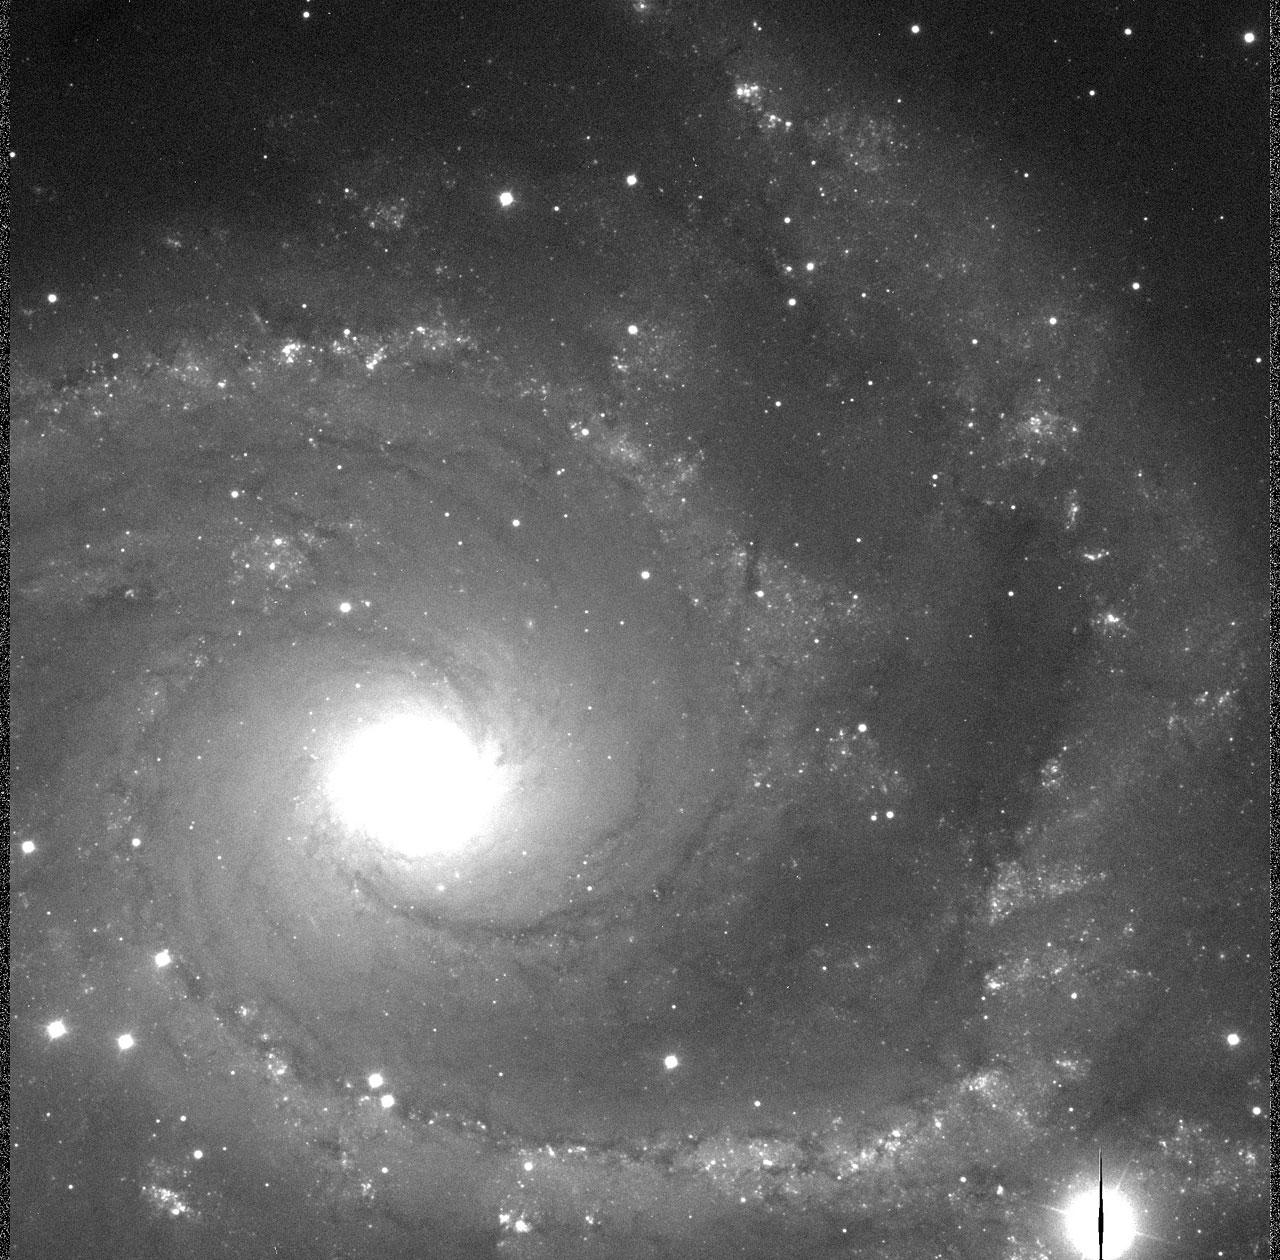 Spiral Galaxy NGC 2997 I-Band-0.25 arcsec